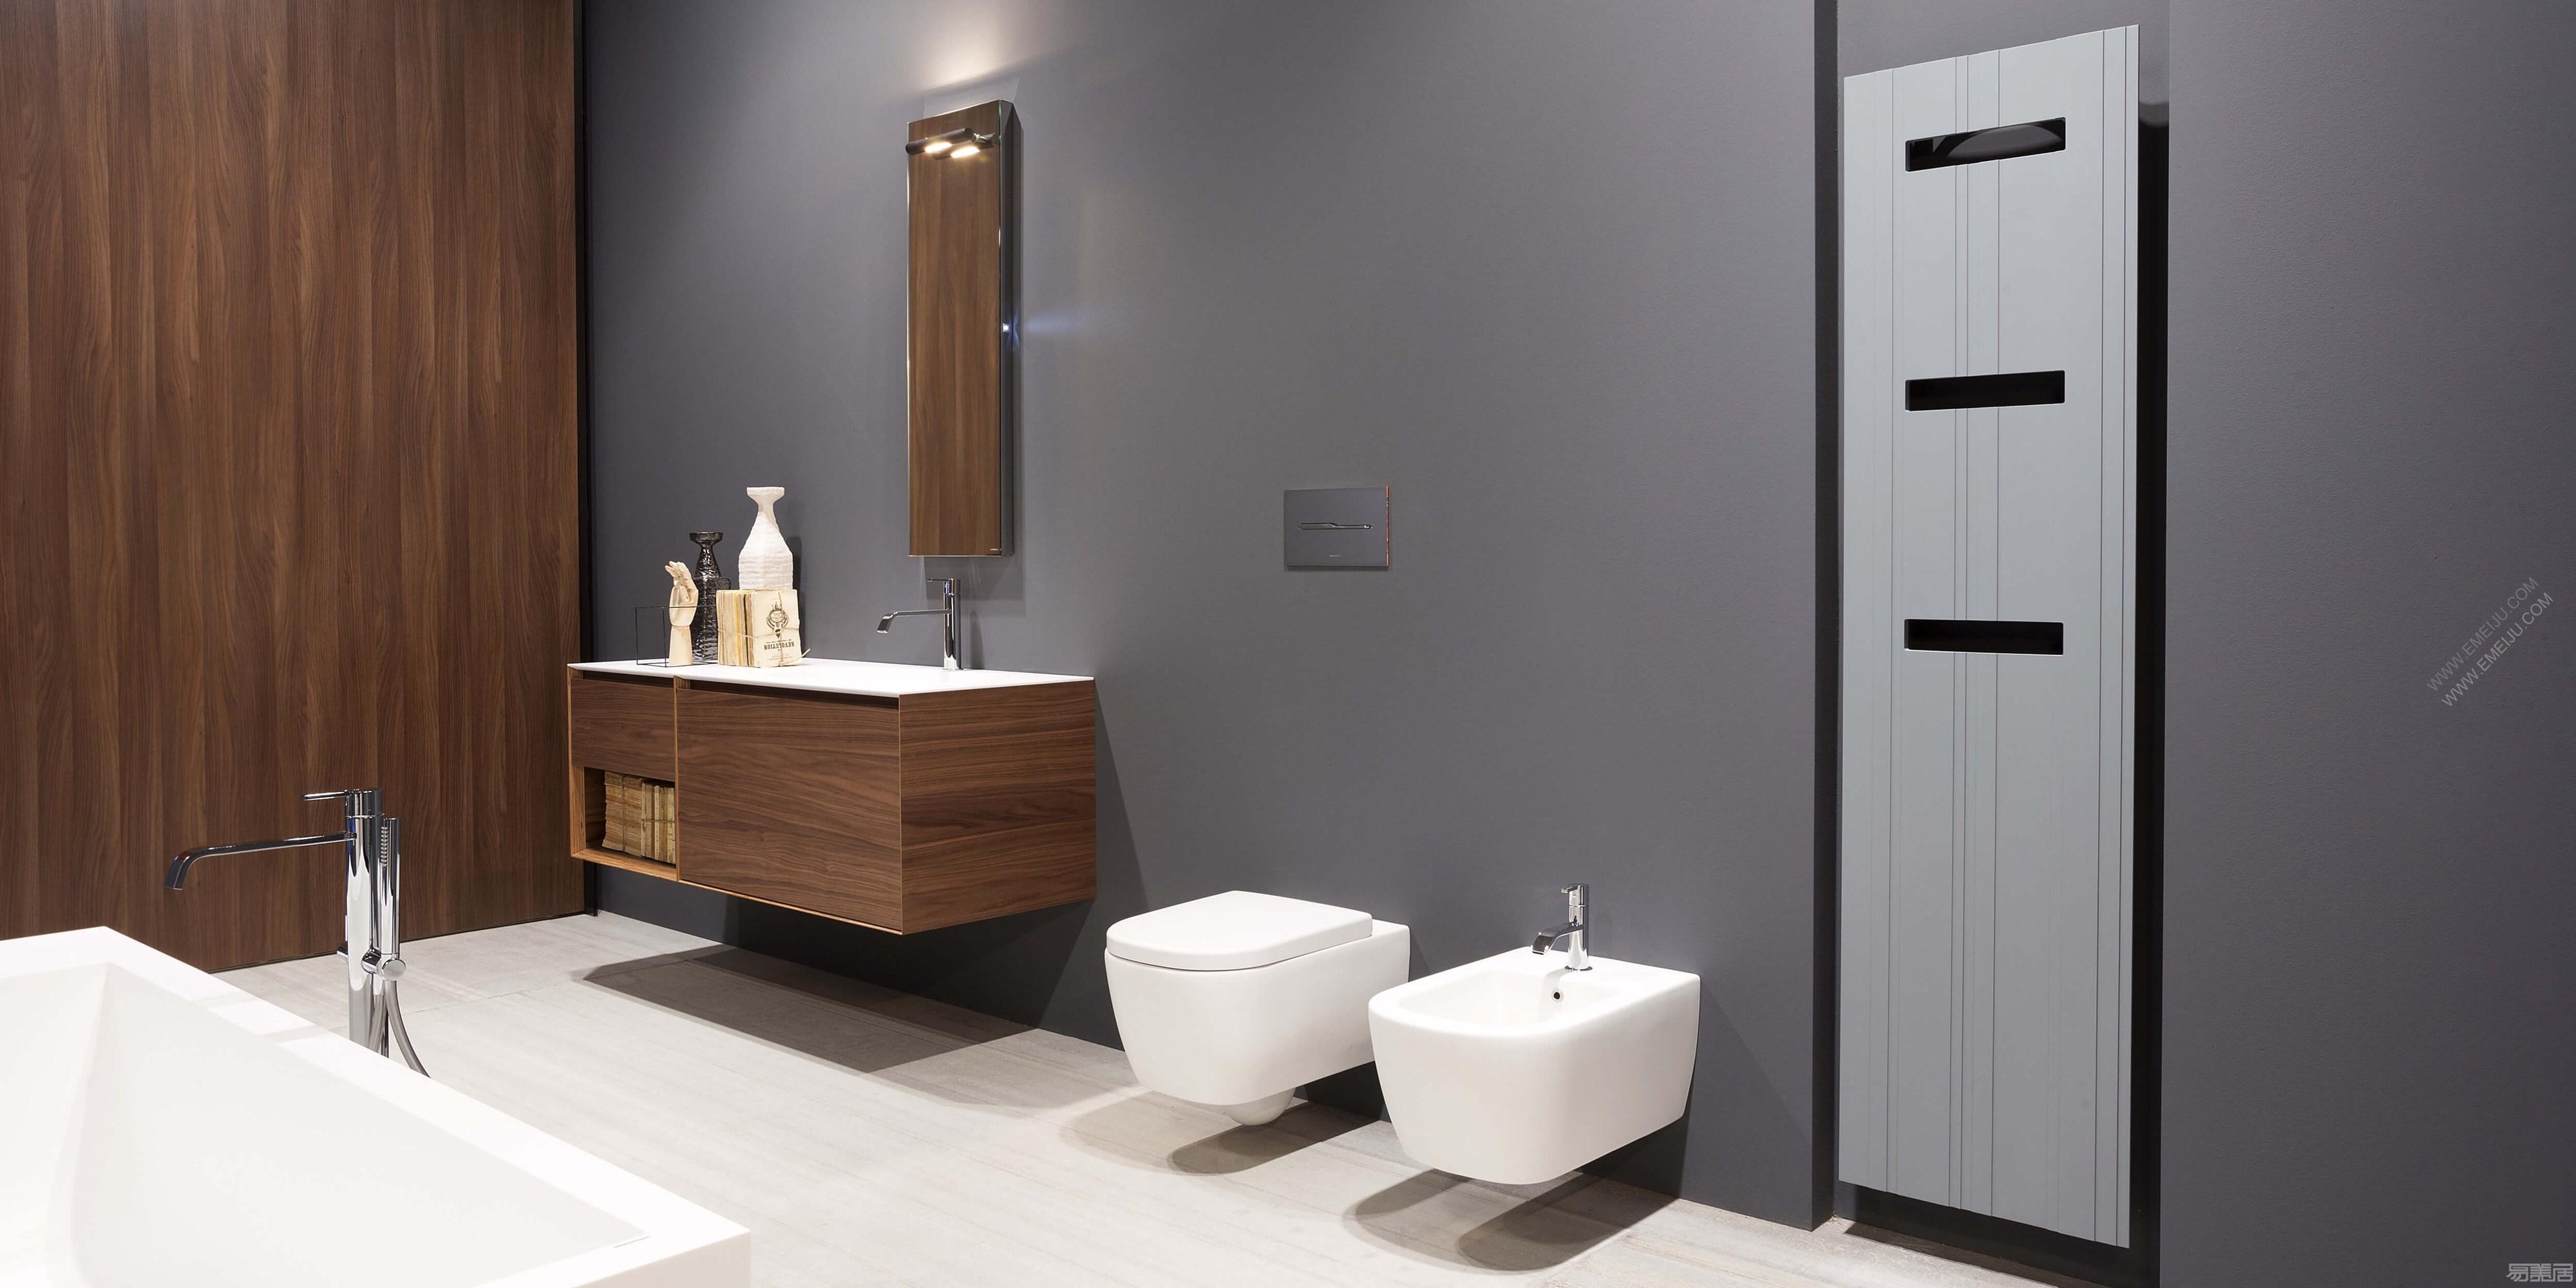 BIT-Antonio-Lupi-Design-105992-reledc60e74.jpg